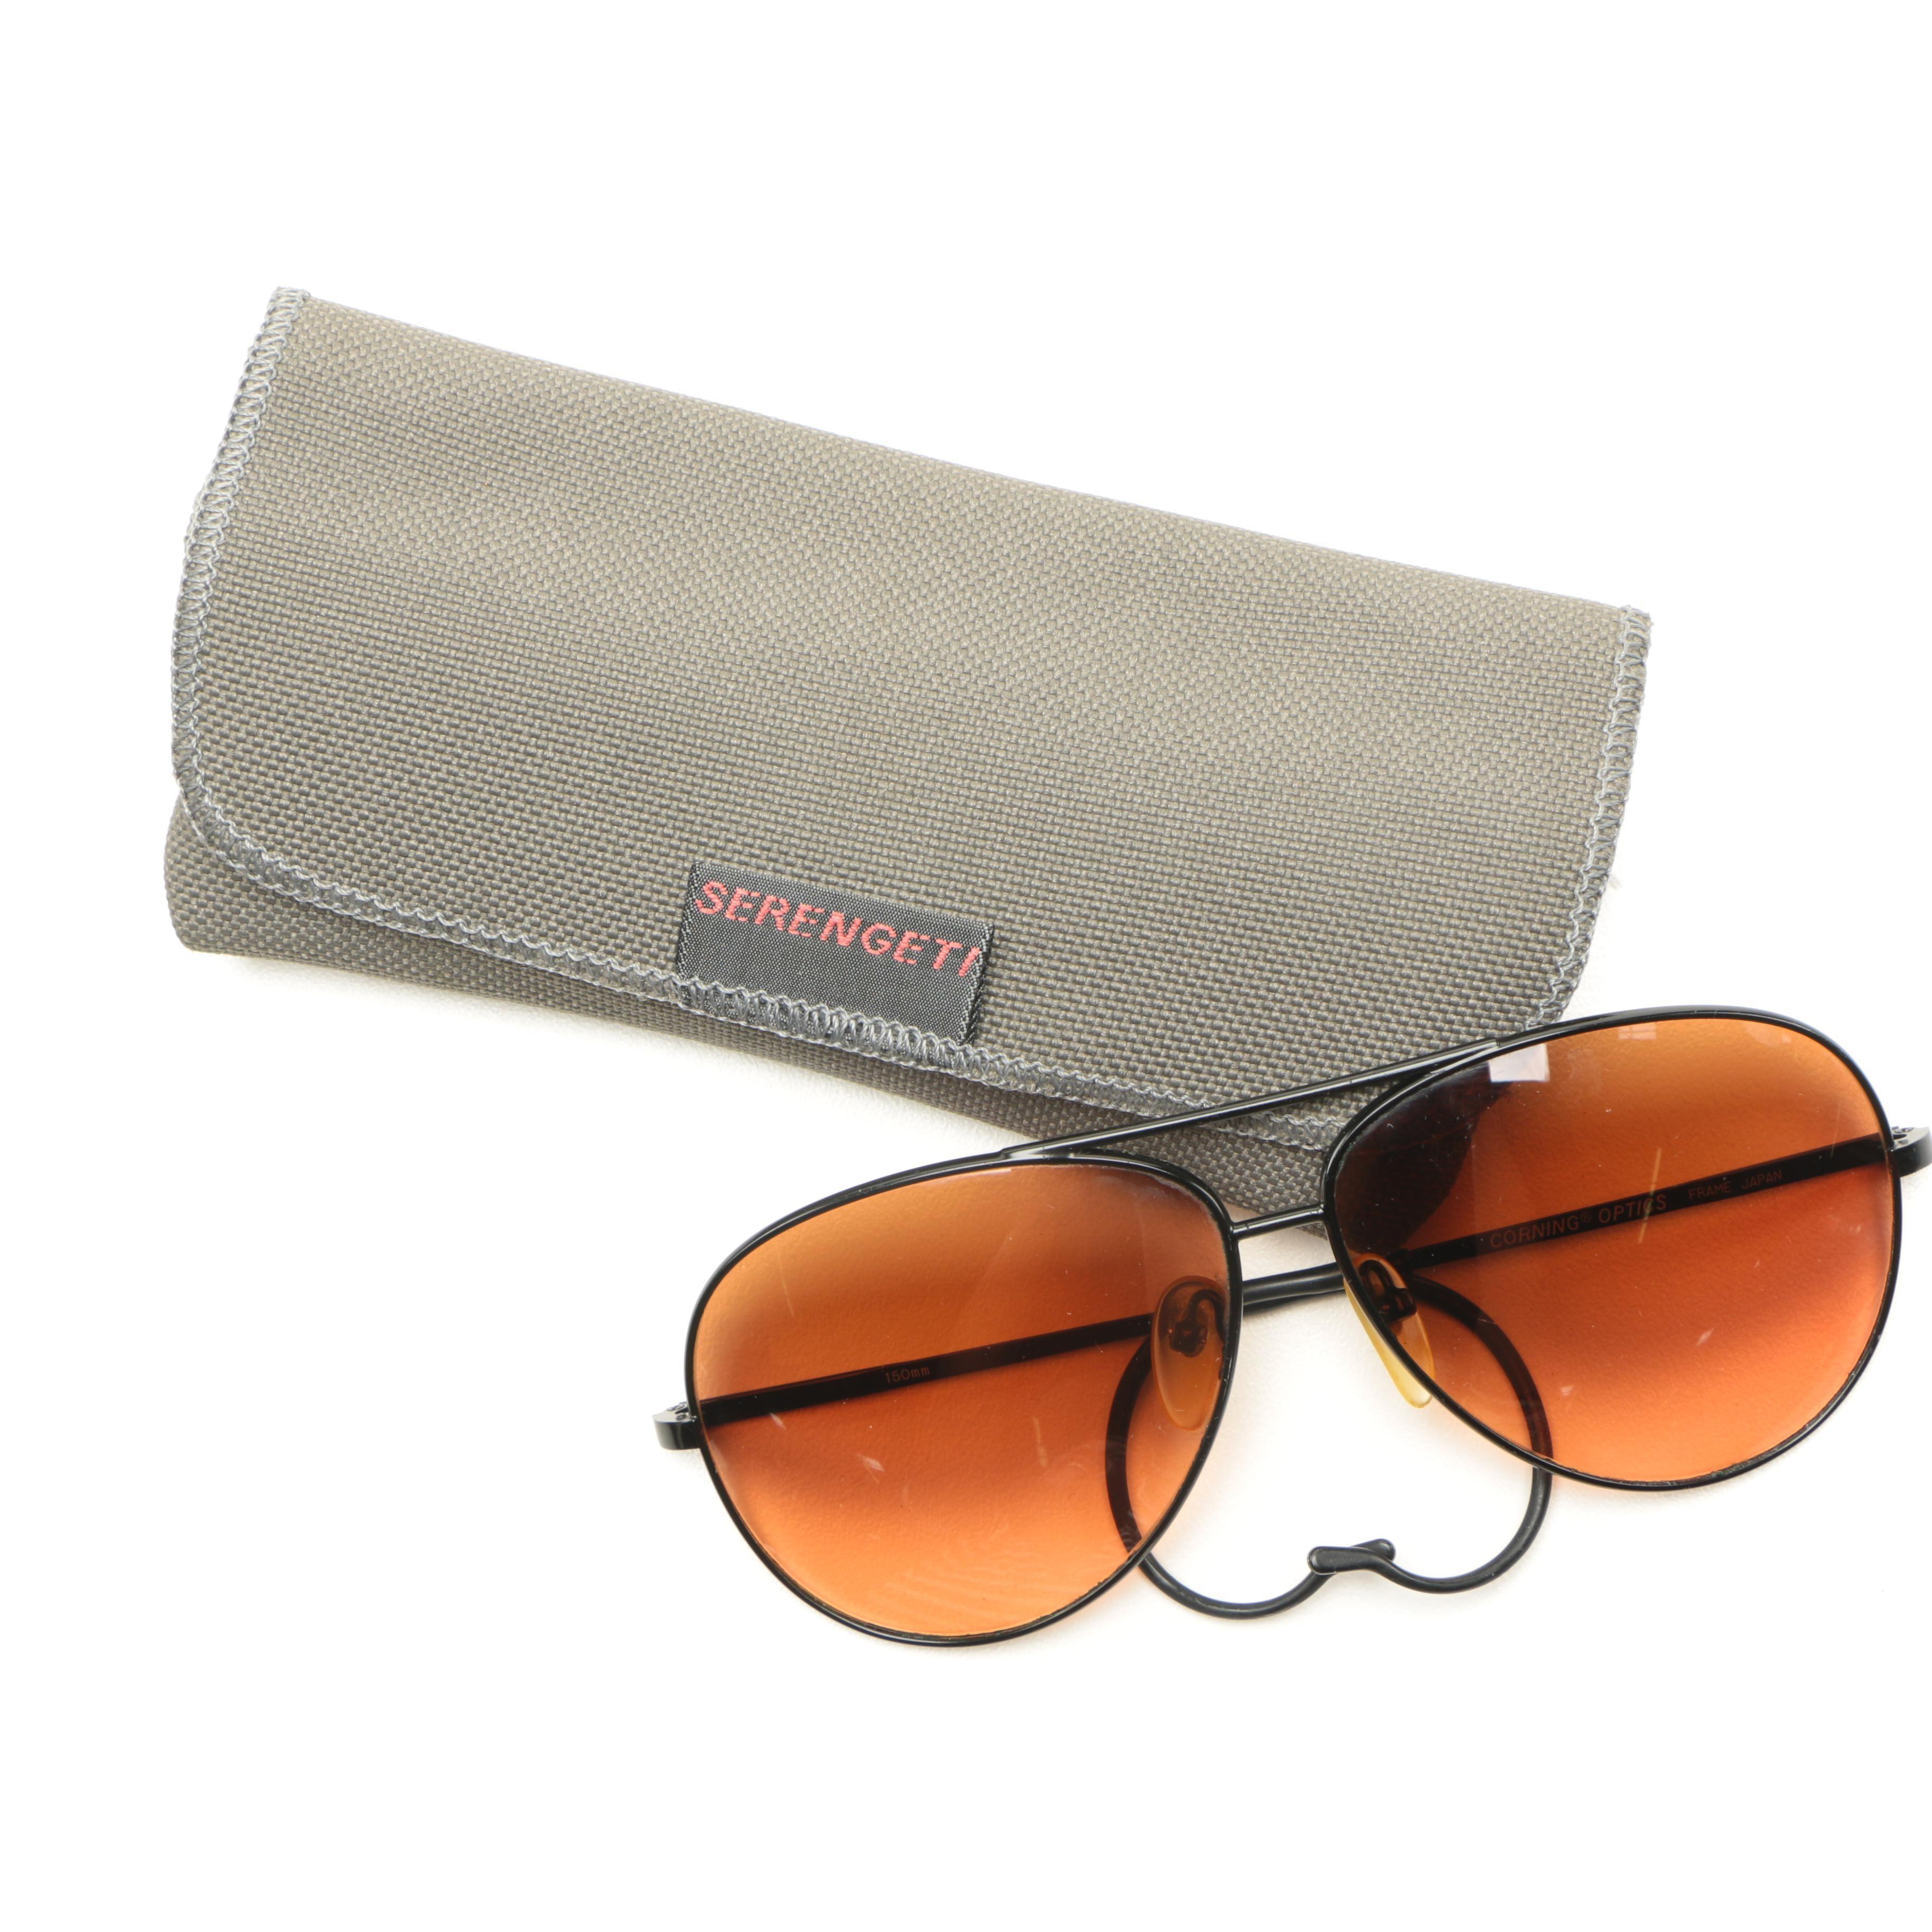 Aviator Sunglasses with Case Including Serengeti and Corning Optics